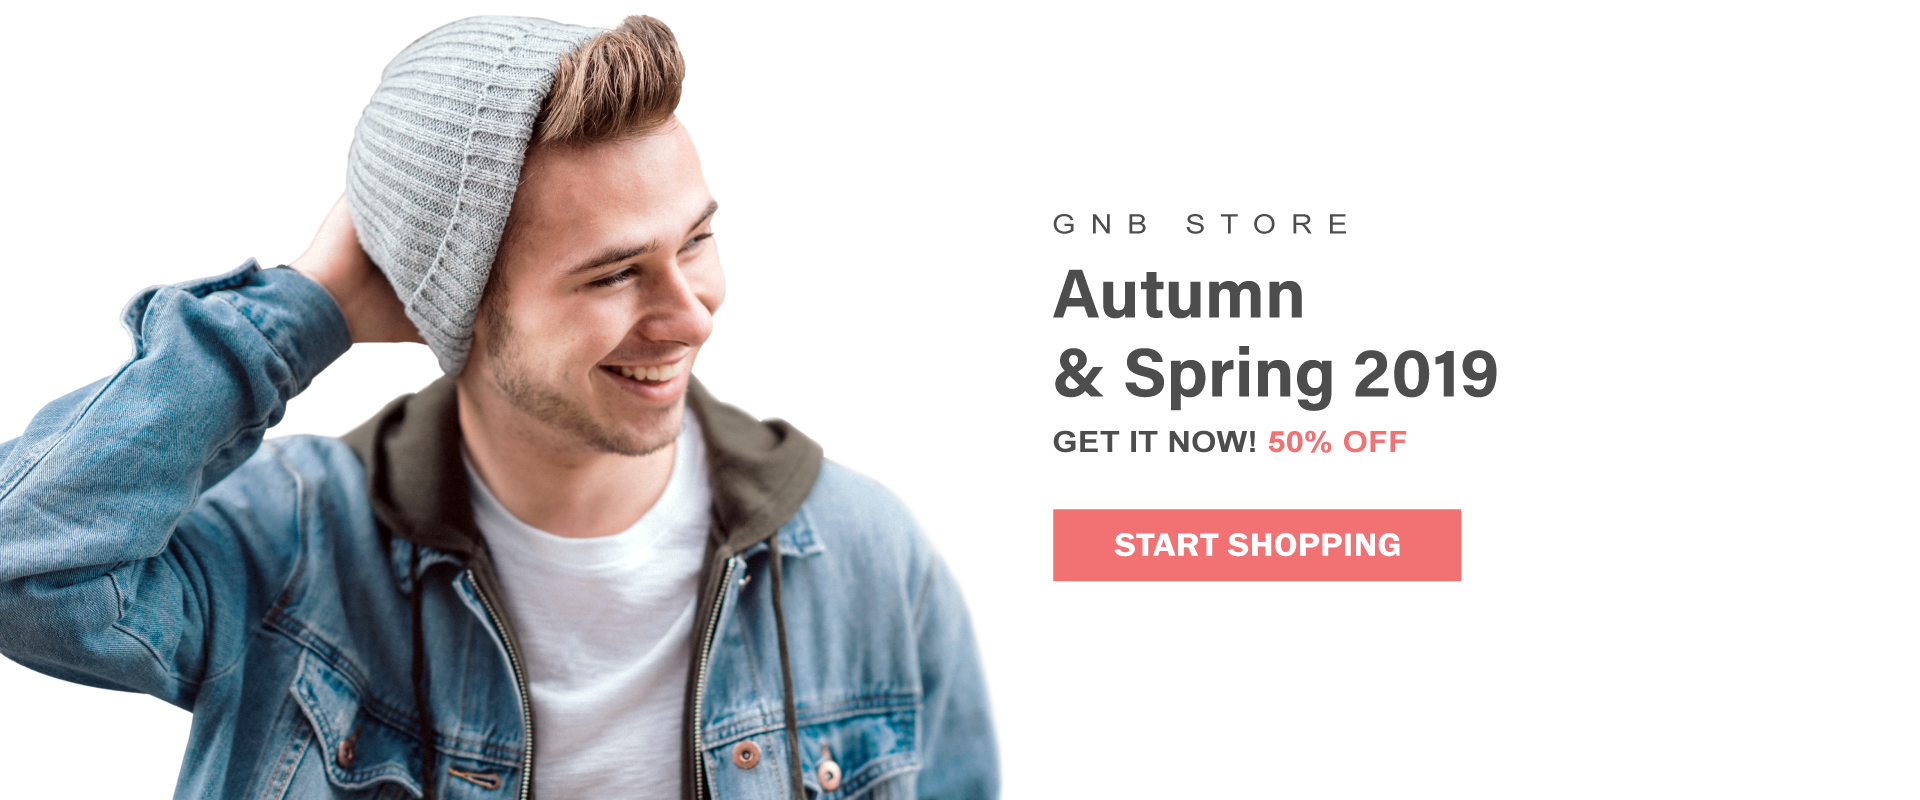 Autumn & Spring 2019